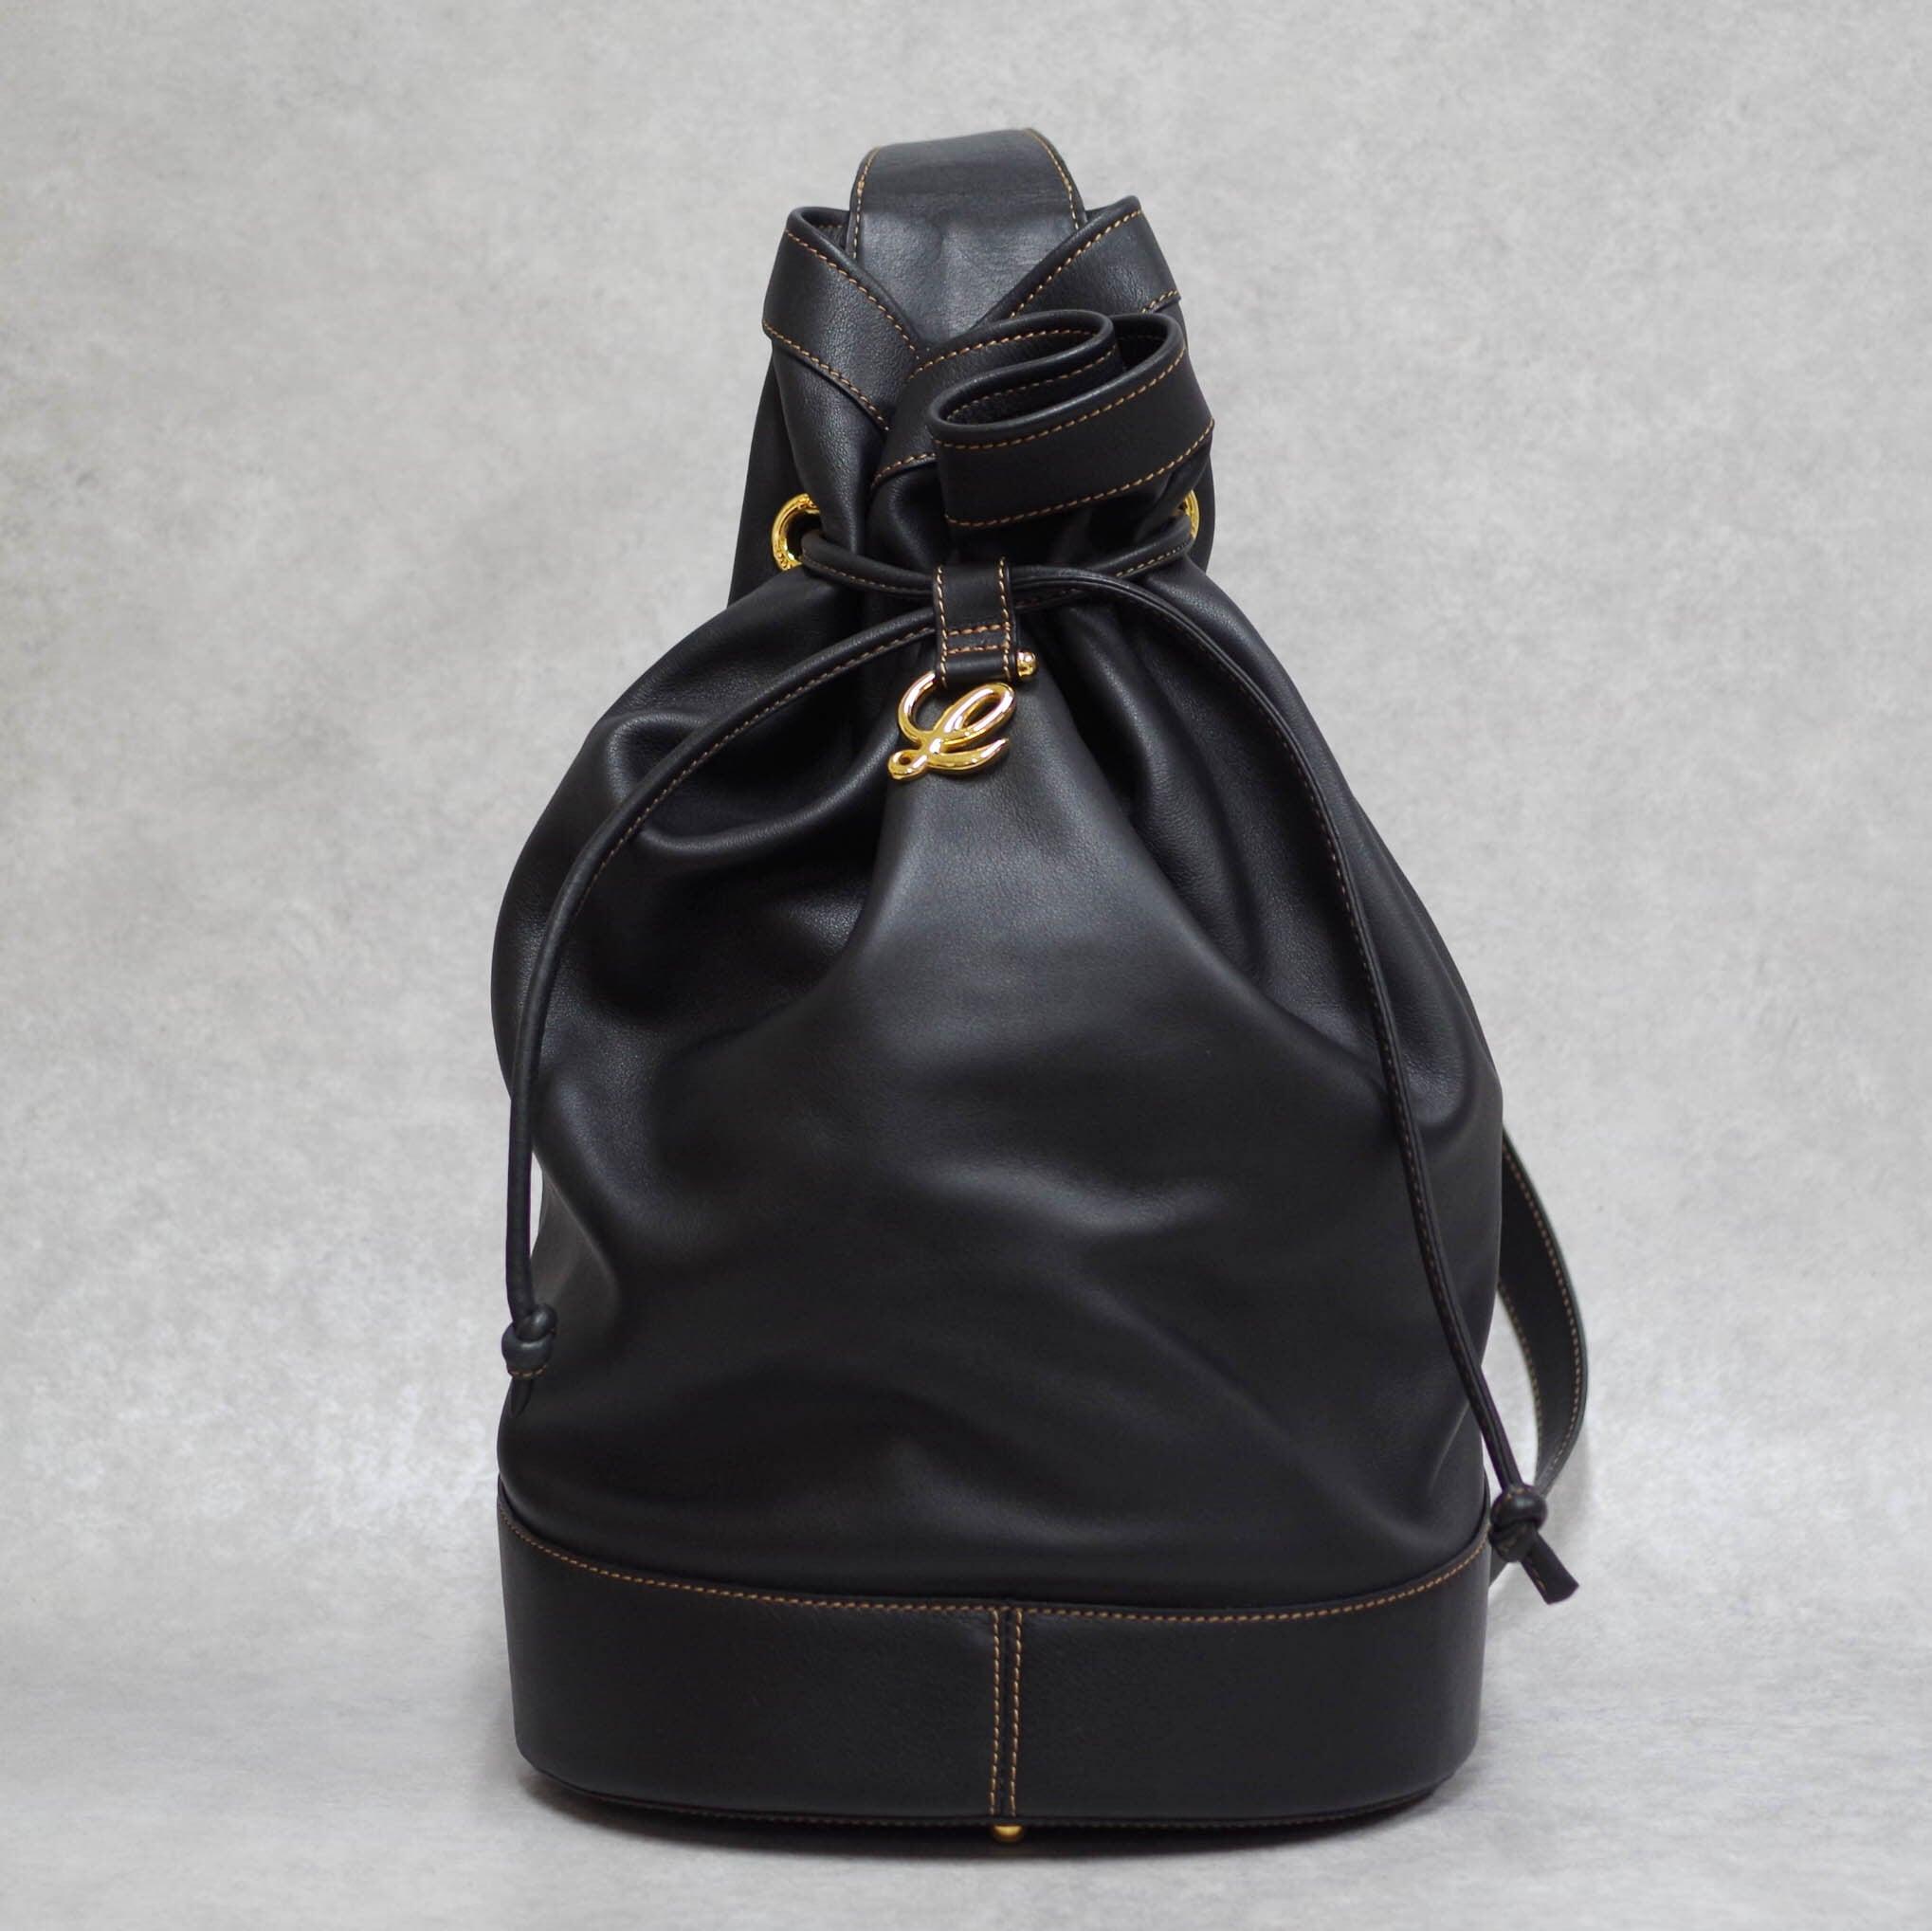 LOEWE ロエベ アントン ワンショルダーバッグ 巾着型 レザー ブラック